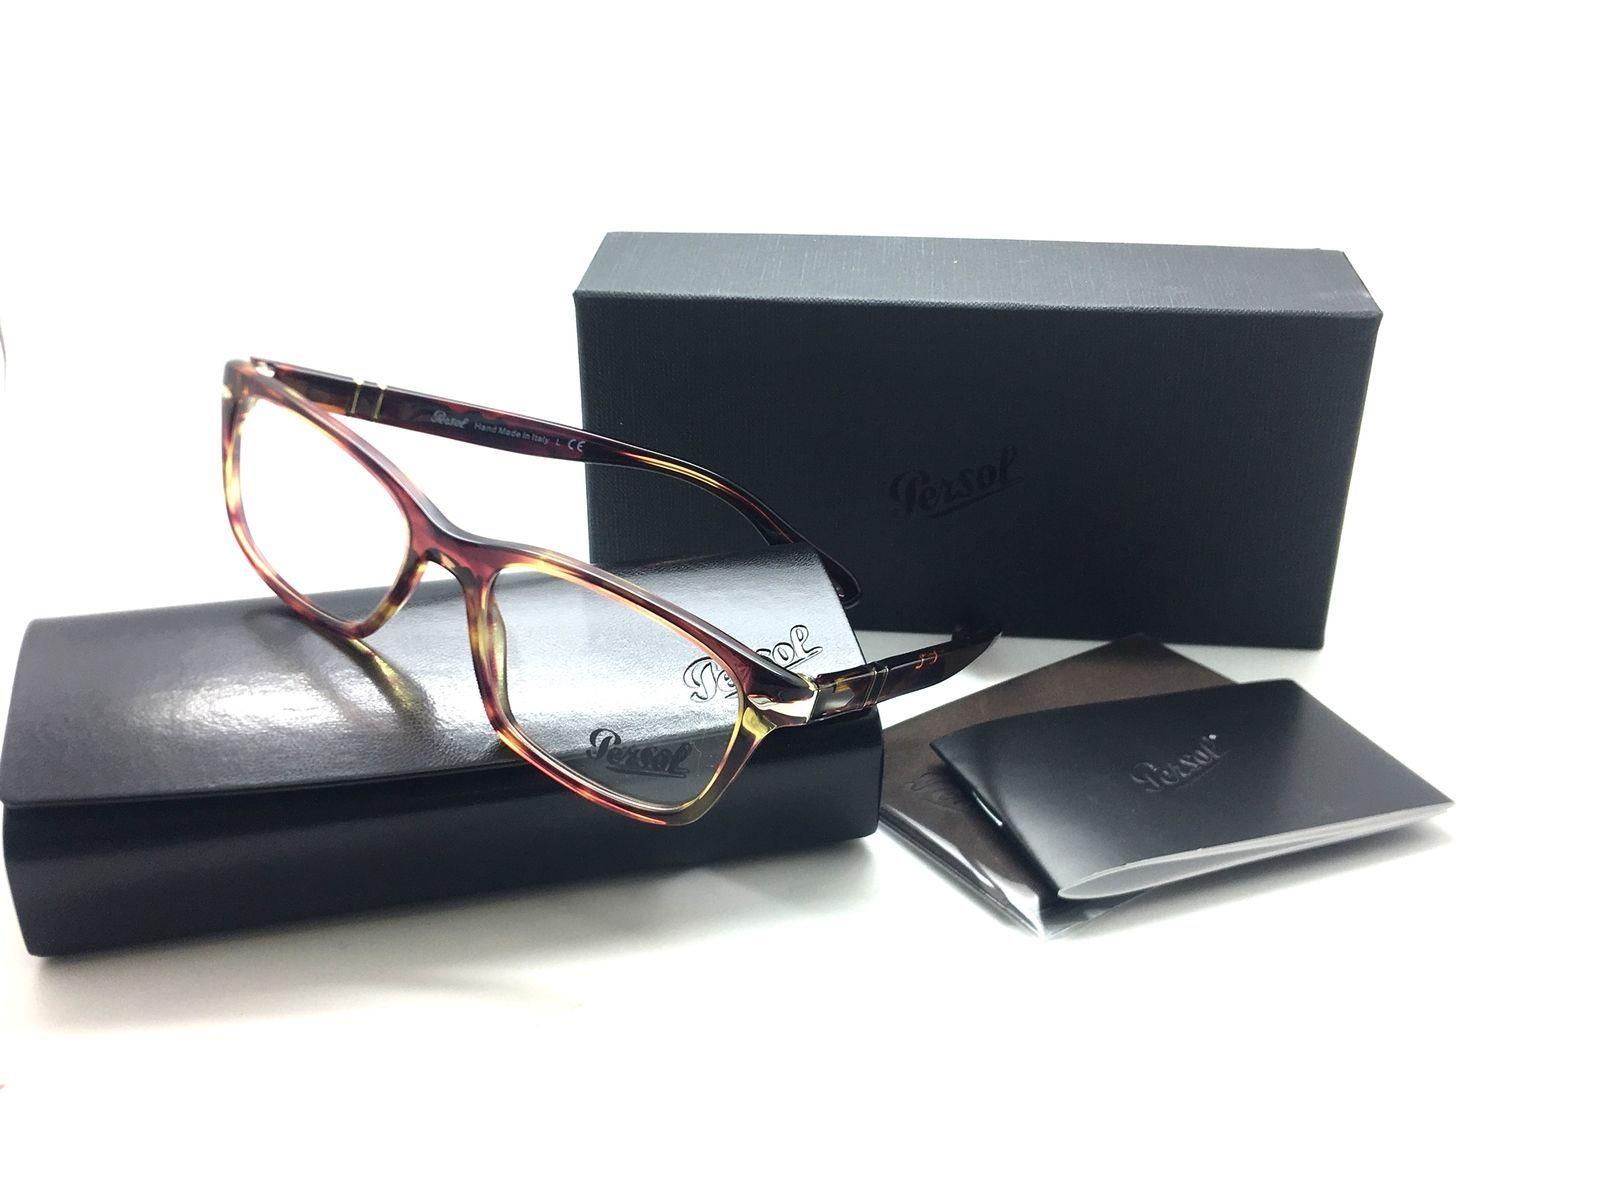 023b8da42e PERSOL Rx-able Eyeglasses 3012-V 1055 52-18 140 Brown Violet Turquoise Frame  -  106.67